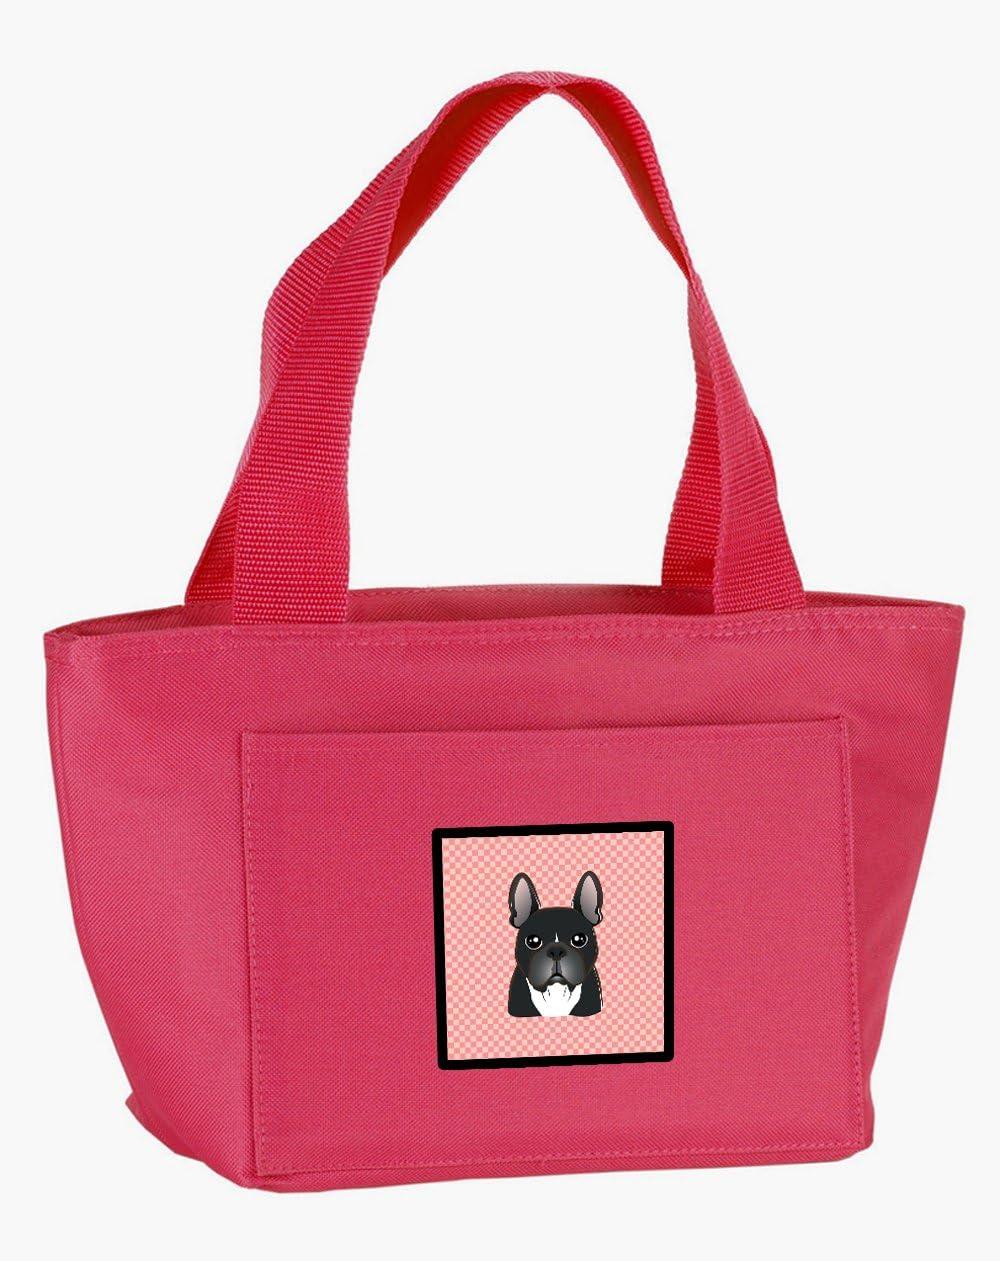 Caroline's Treasures BB1227PK-8808 Checkerboard Pink French Bulldog Lunch Bag, multicolor